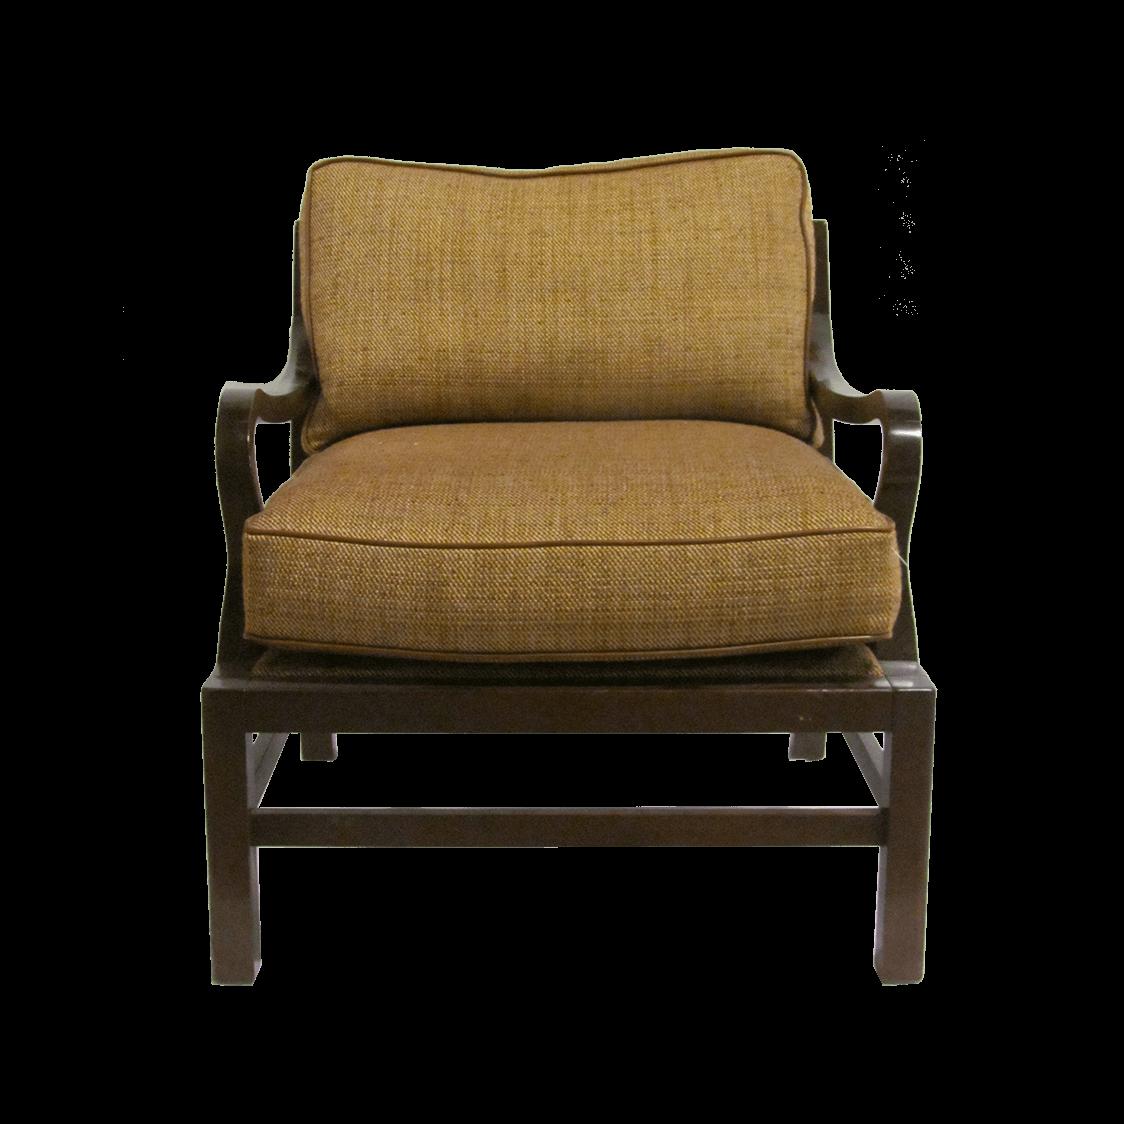 Muji Lounge Chair Kdrshowrooms Com